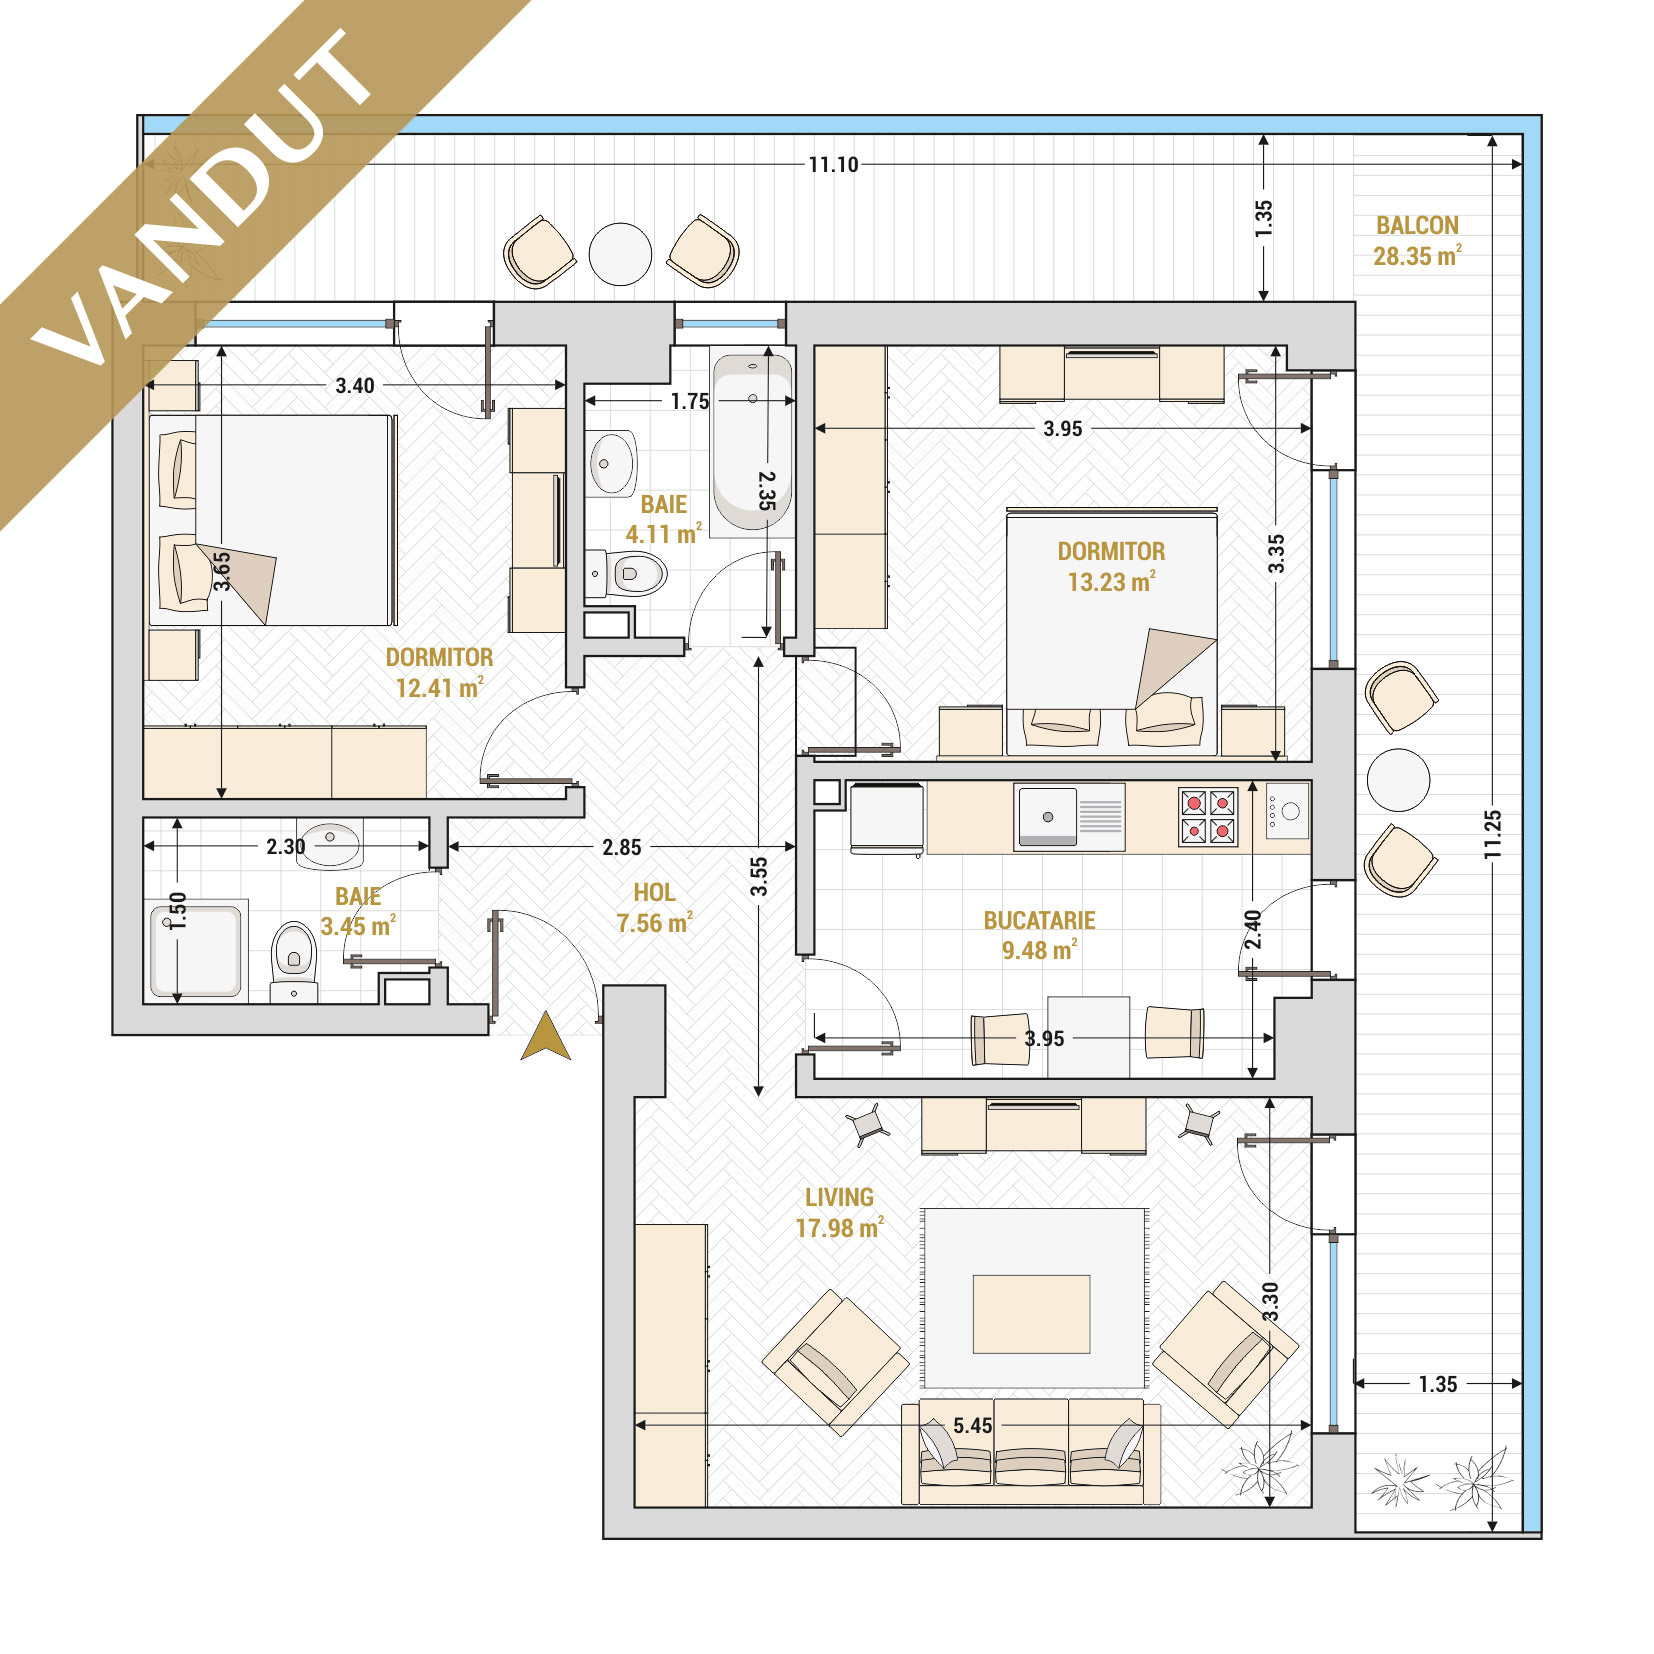 Apartament 3 camere de vanzare Bucuresti - Catedral Residence - Marriott, Piata Unirii, 13 Septembrie, Izvor - Tip 6 - T2A - V